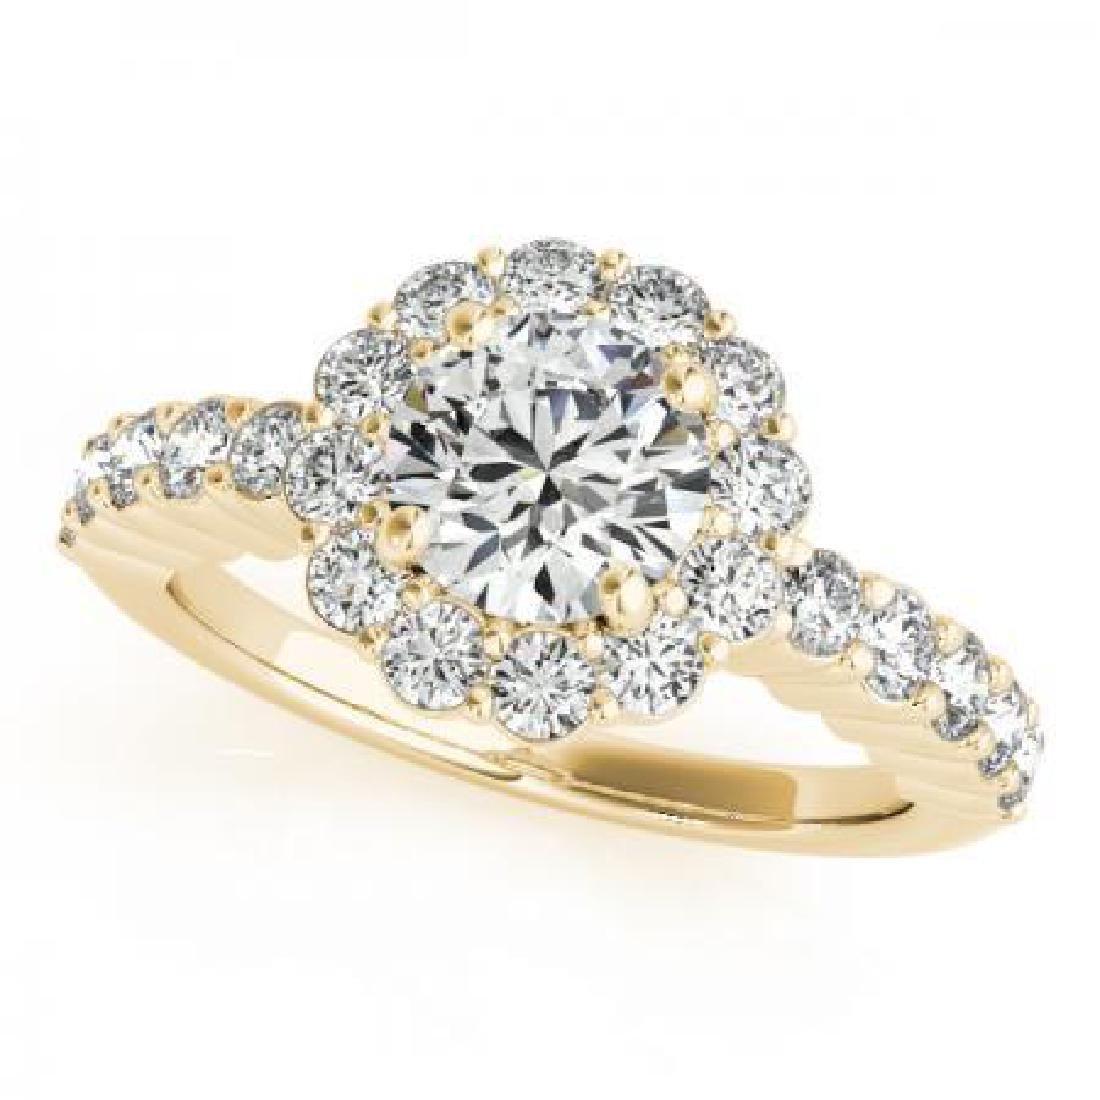 CERTIFIED 18K YELLOW GOLD 1.21 CT G-H/VS-SI1 DIAMOND HA